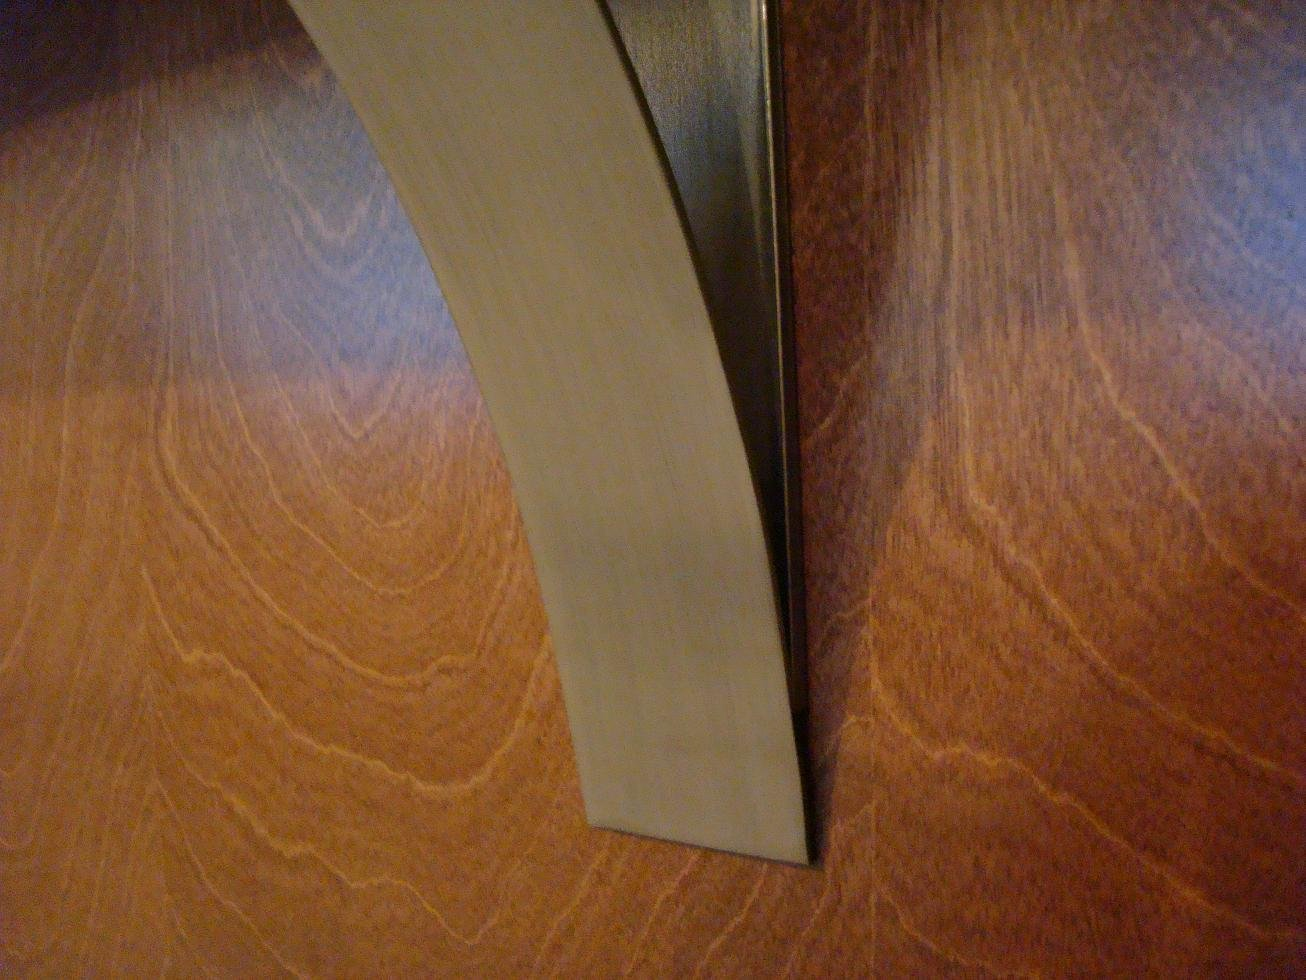 Amazon.com: Modern 9 Inch Brushed Stainless Steel Counter Top Corbel  Support Bracket Granite Quartz Marble: Handmade